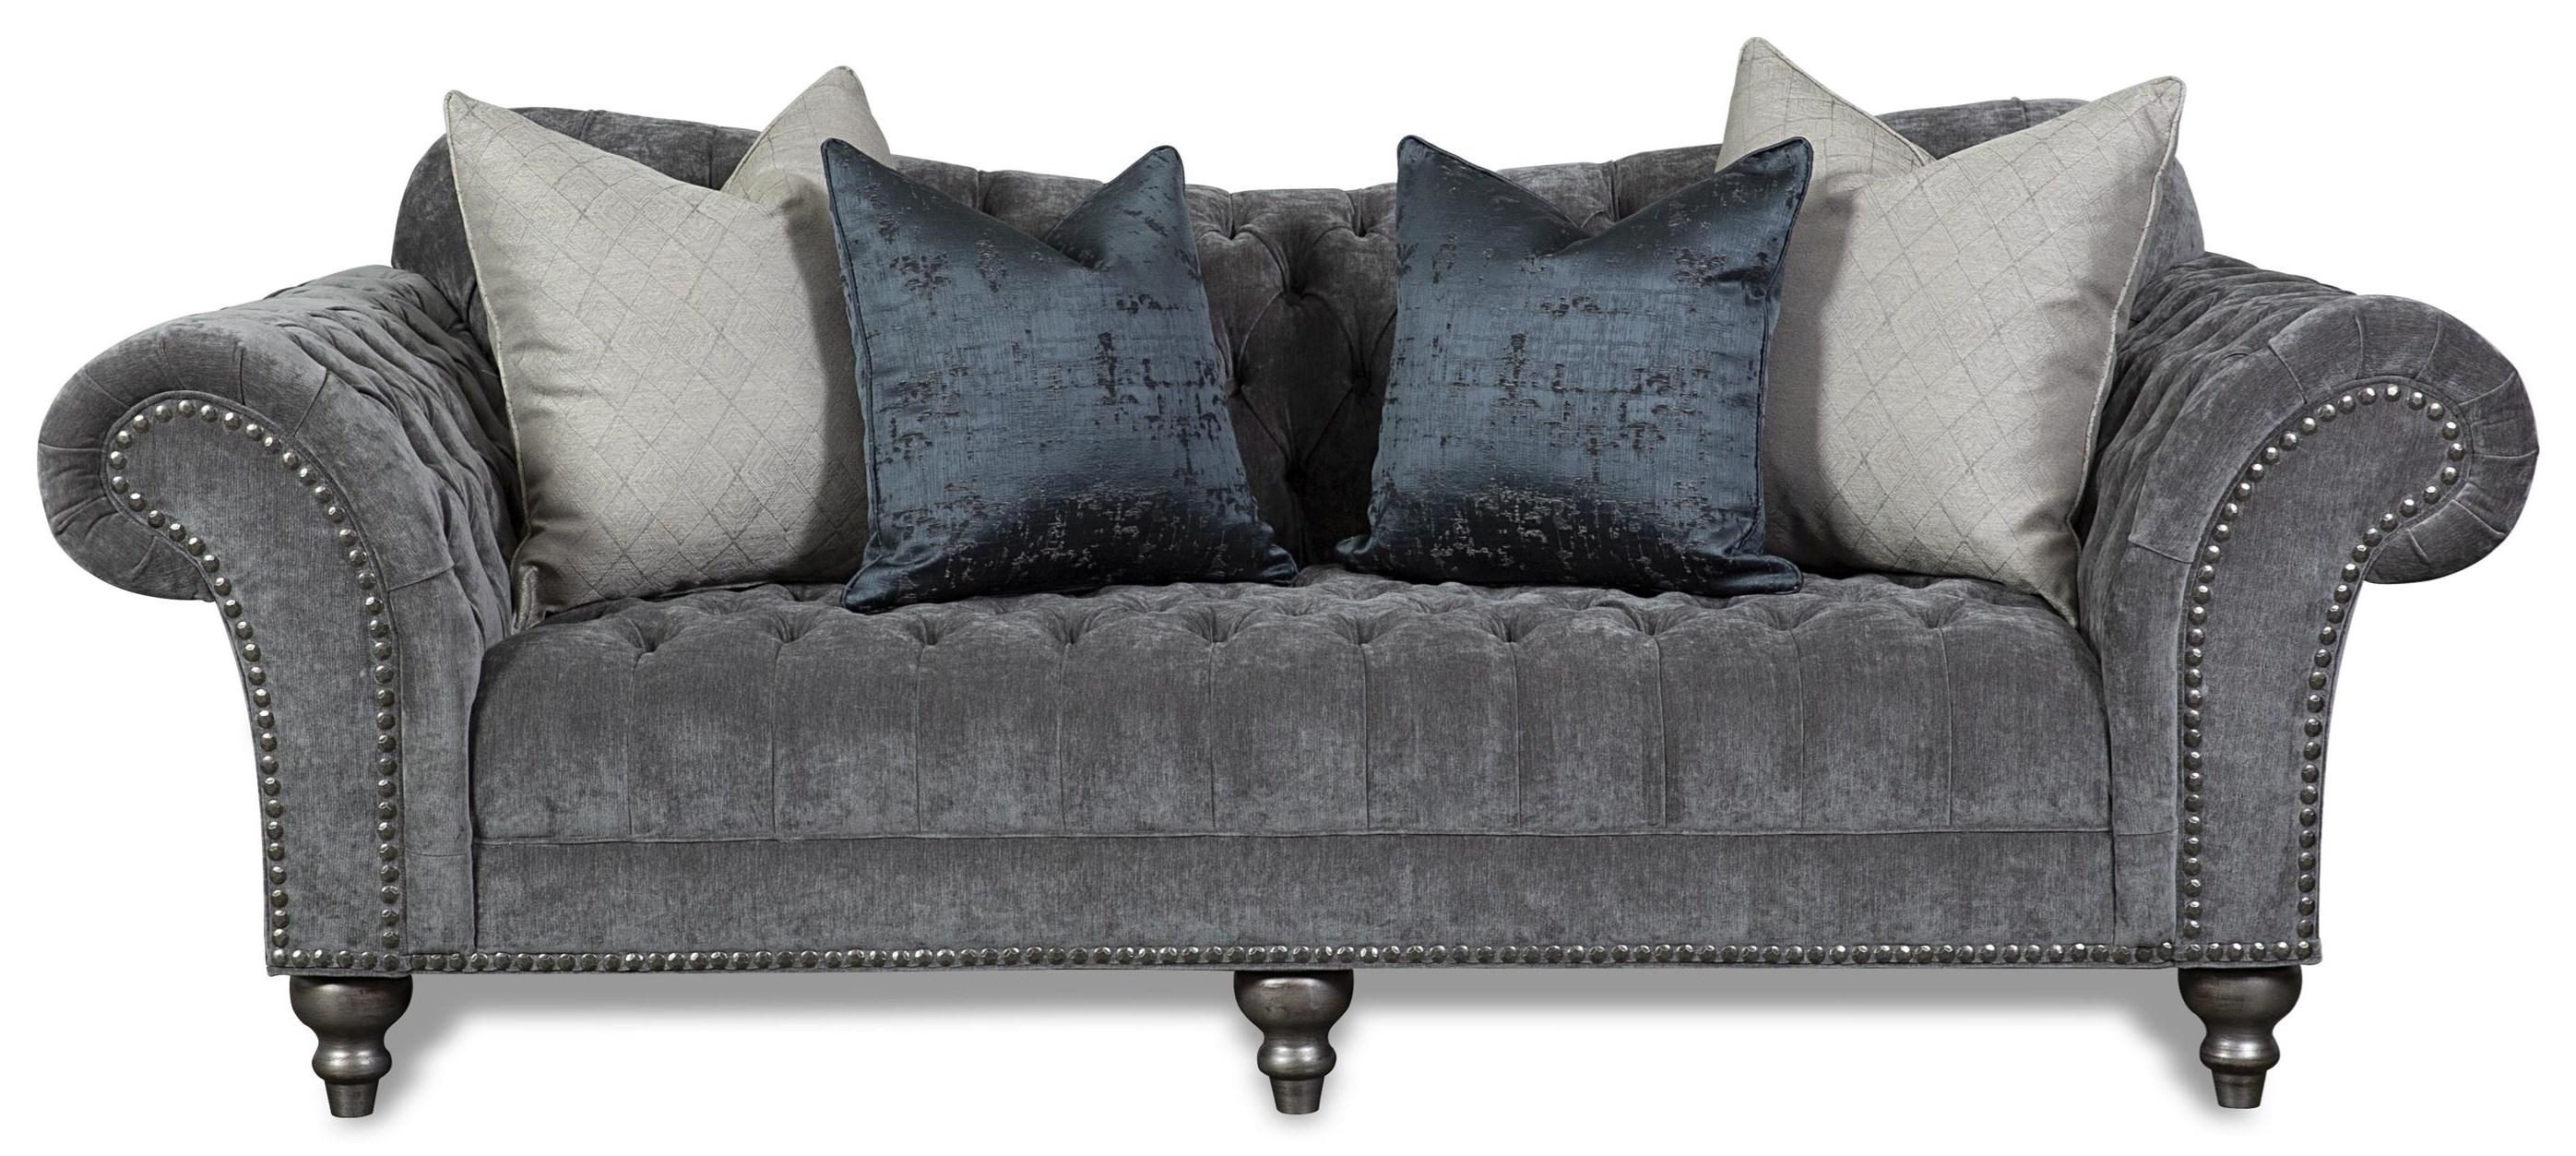 Garbo Garbo Sofa by Aria Designs at Morris Home